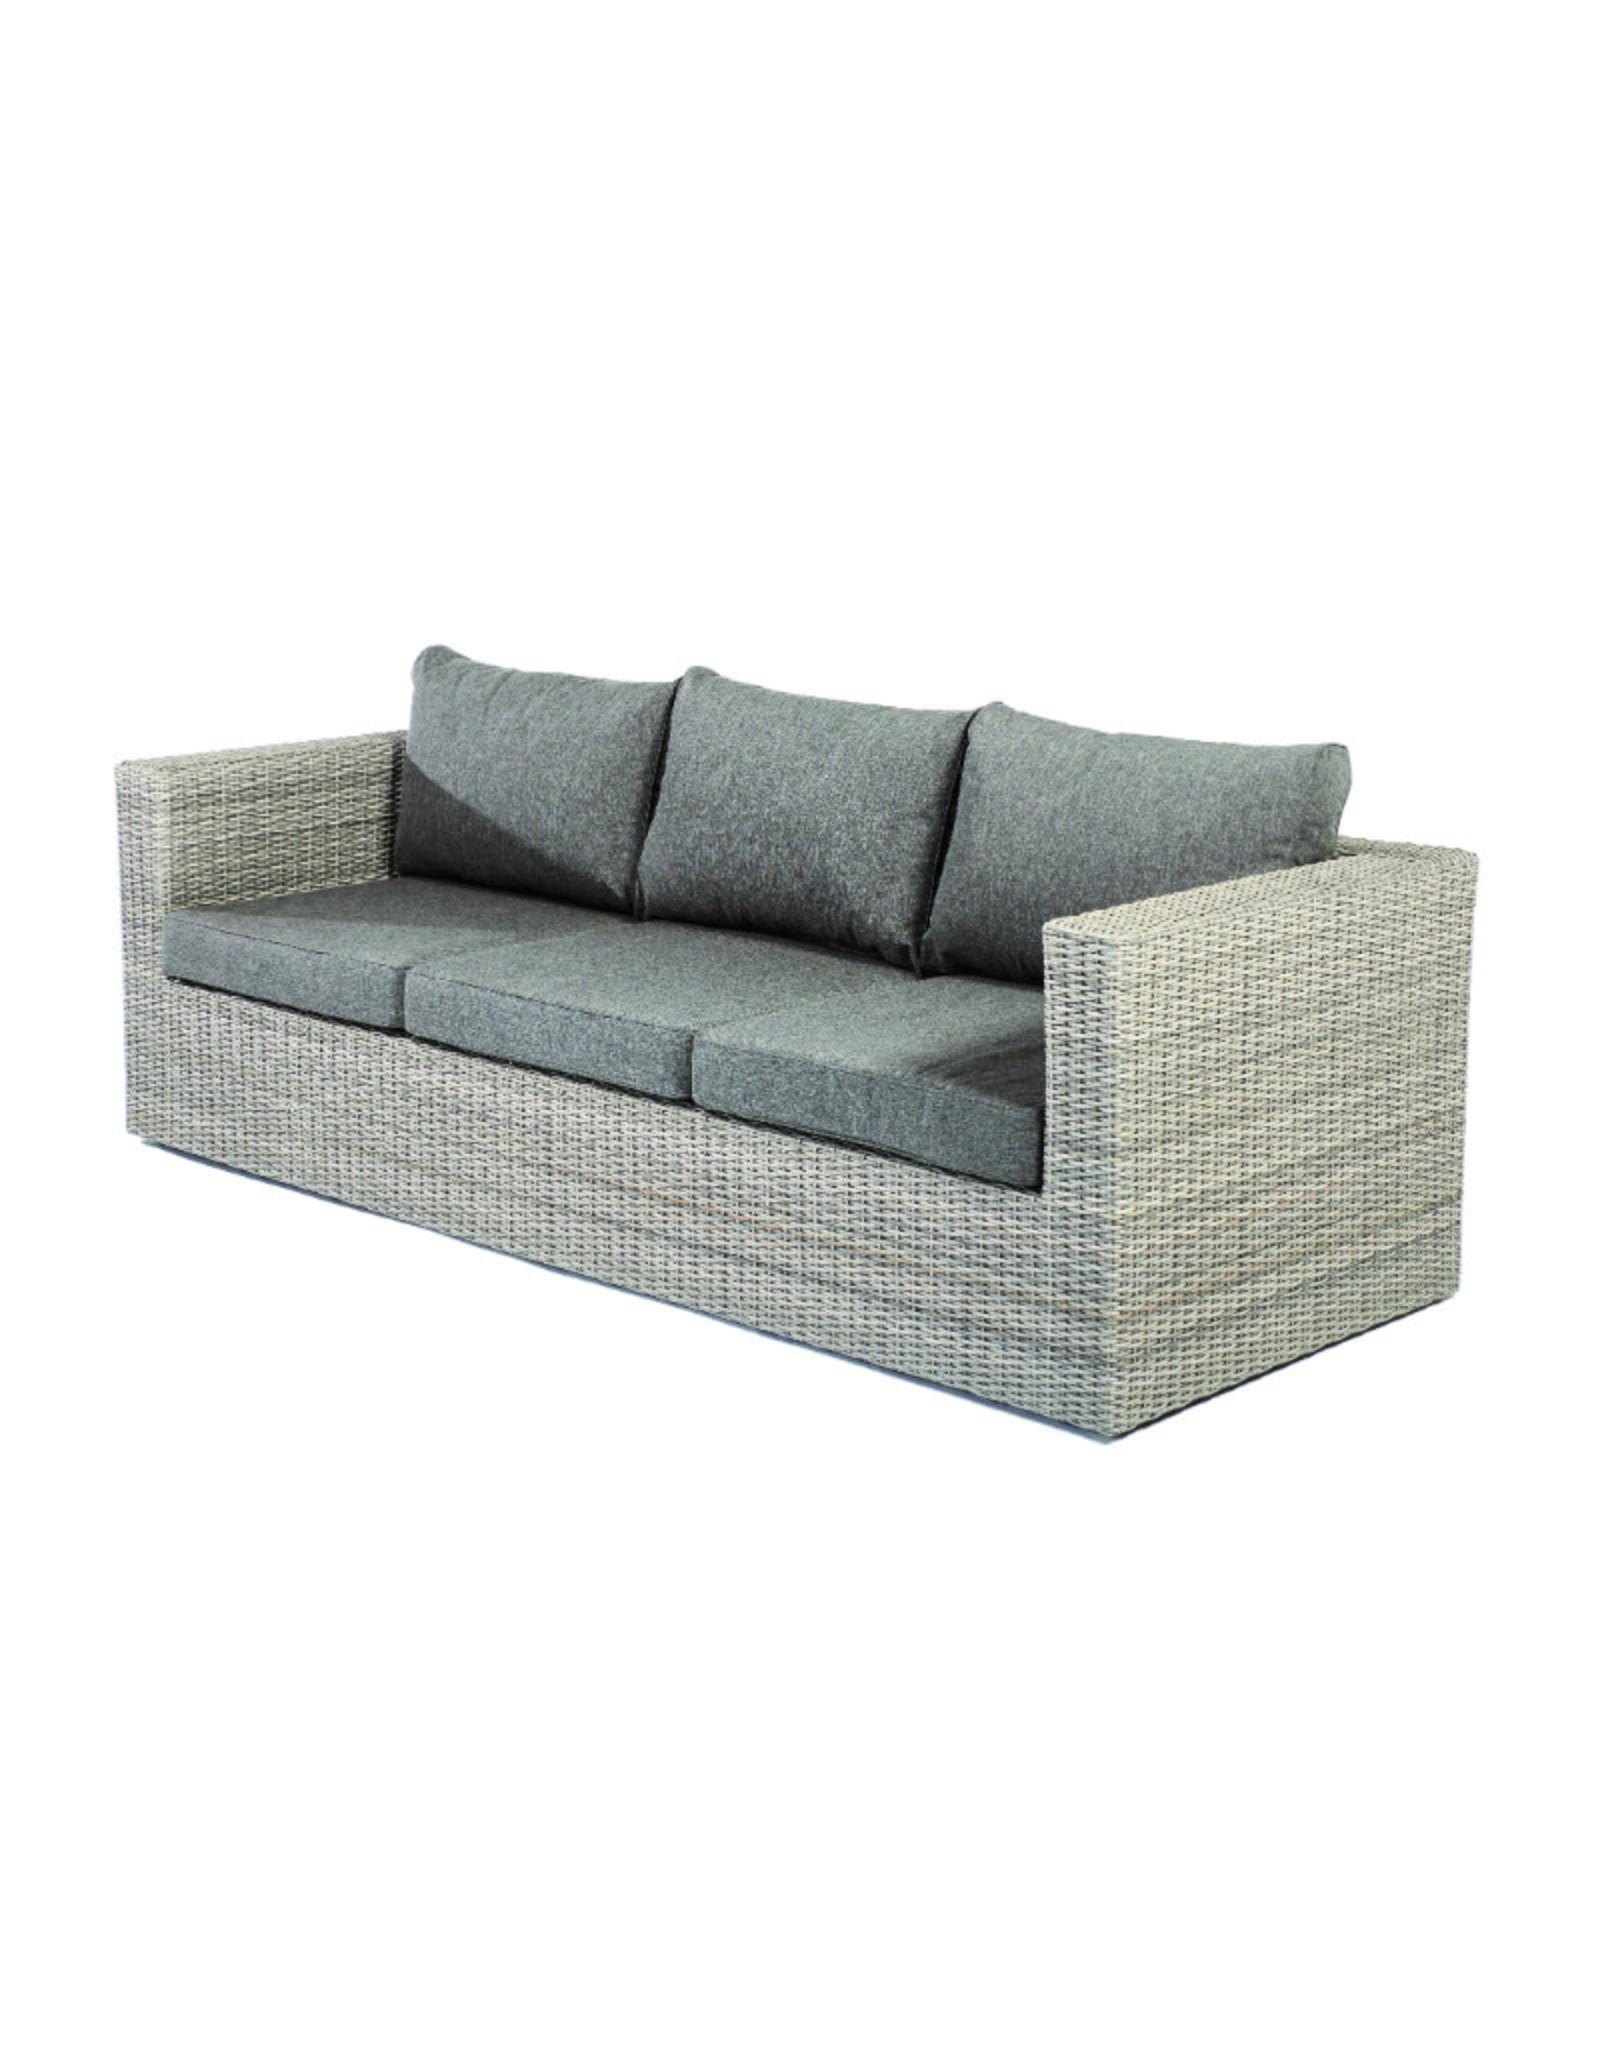 Tierra Outdoor Tierra Outdoor Illias Lounge Bench 3-Seater